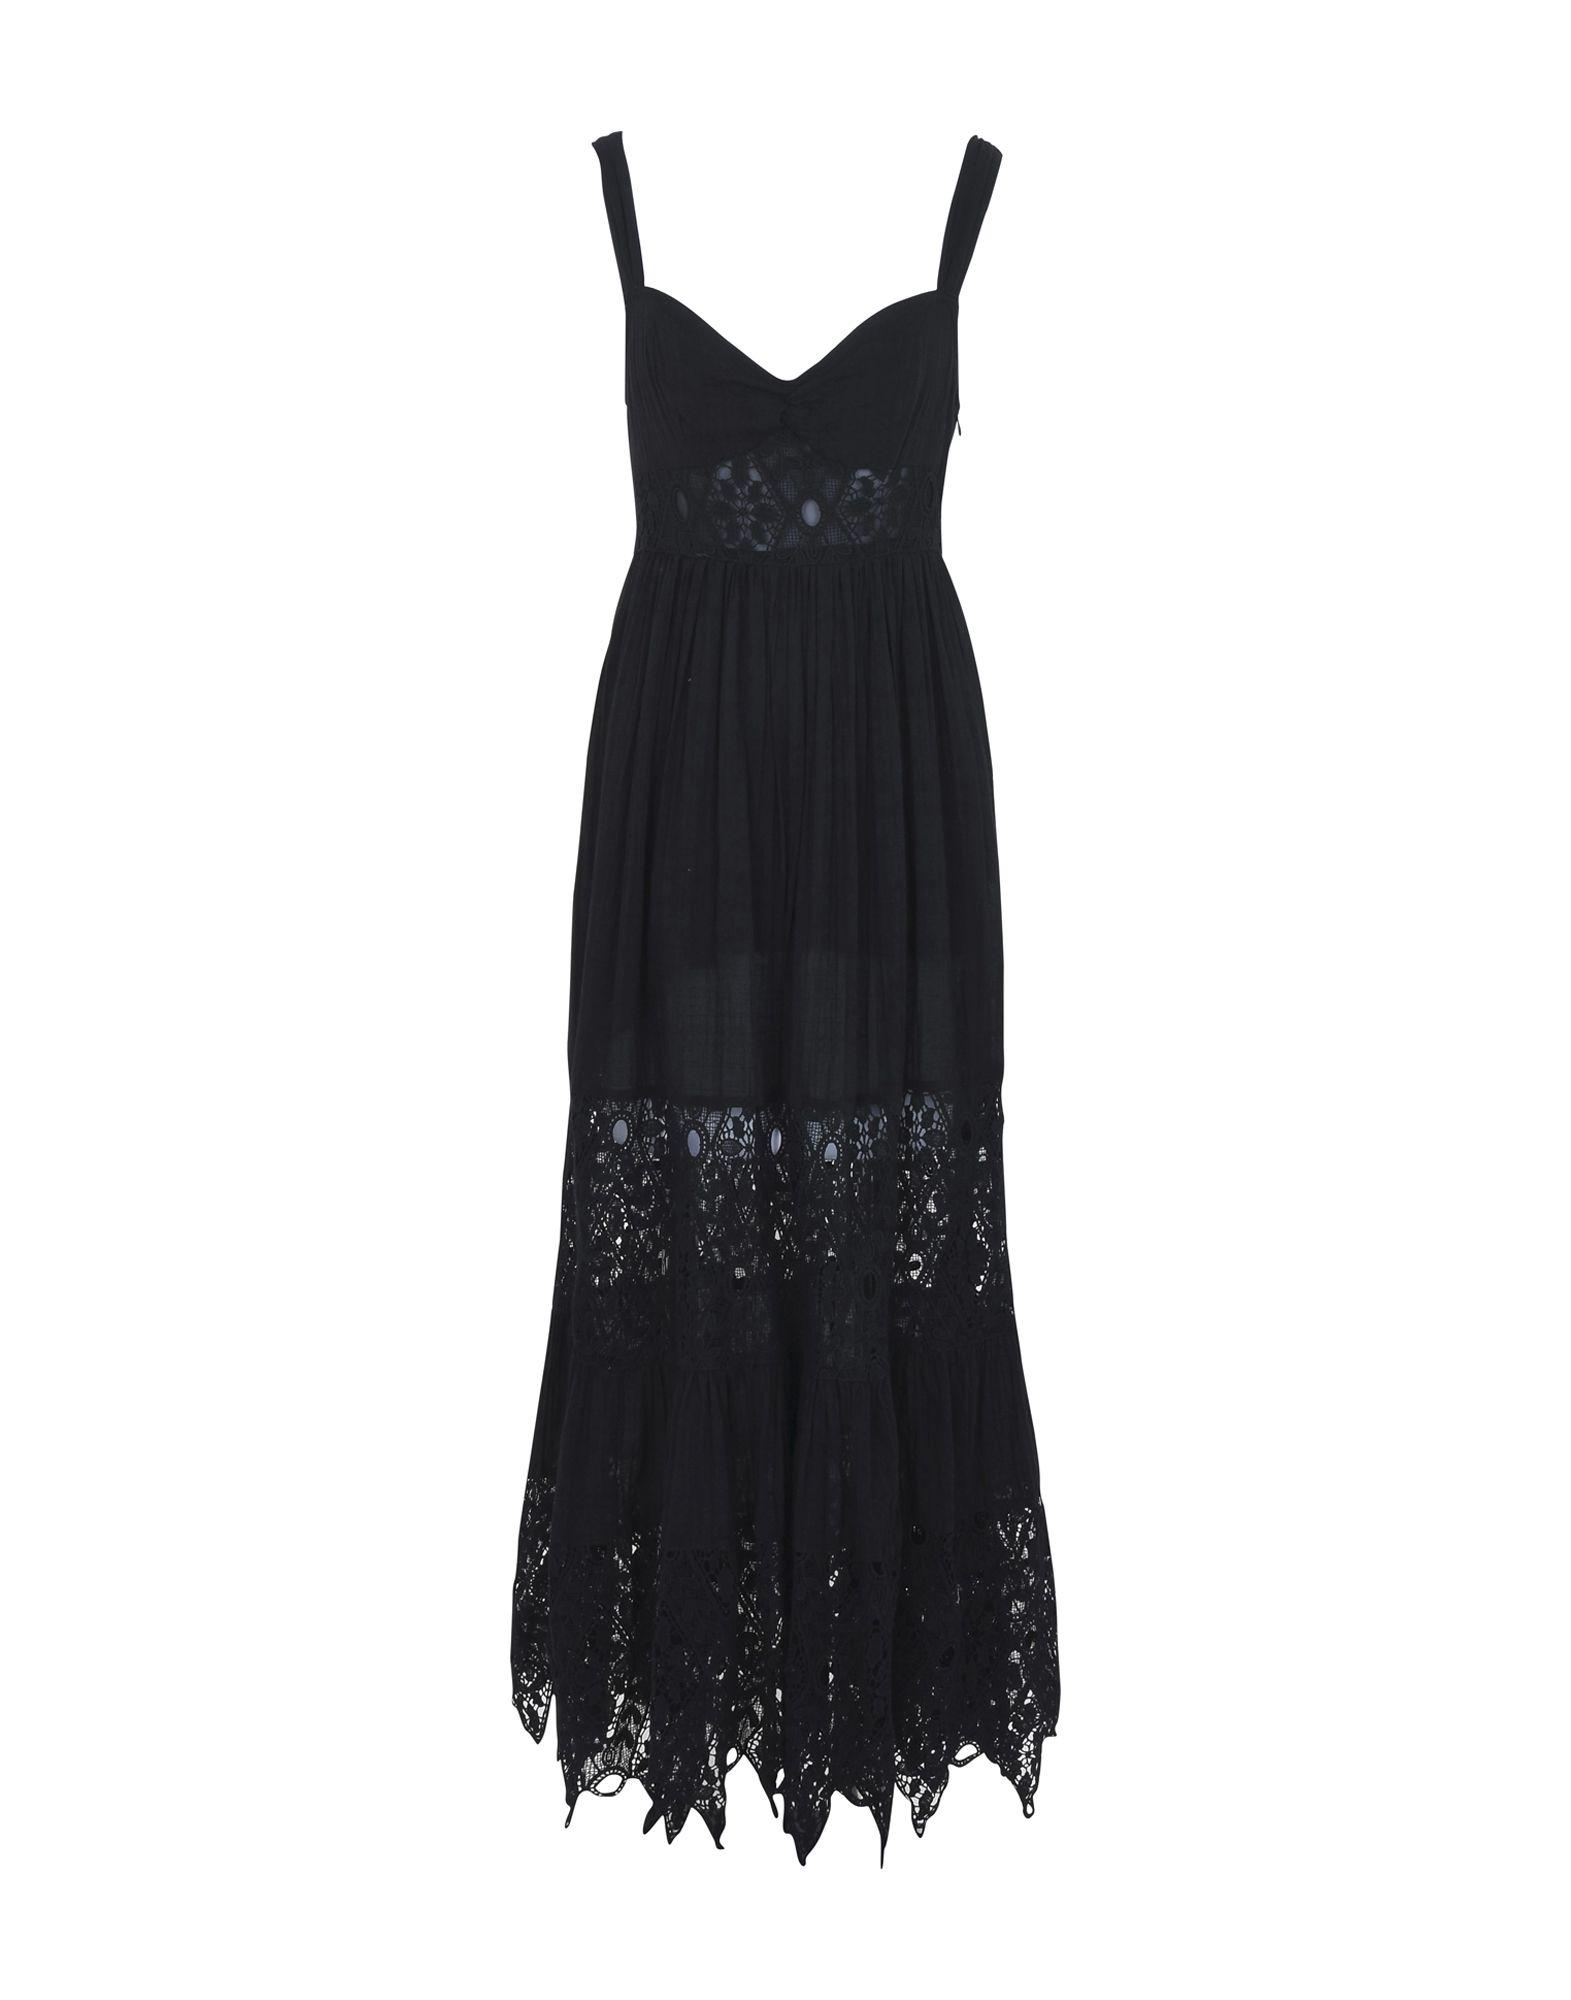 Evening gowns, formal & elegant designer evening gowns | YOOX